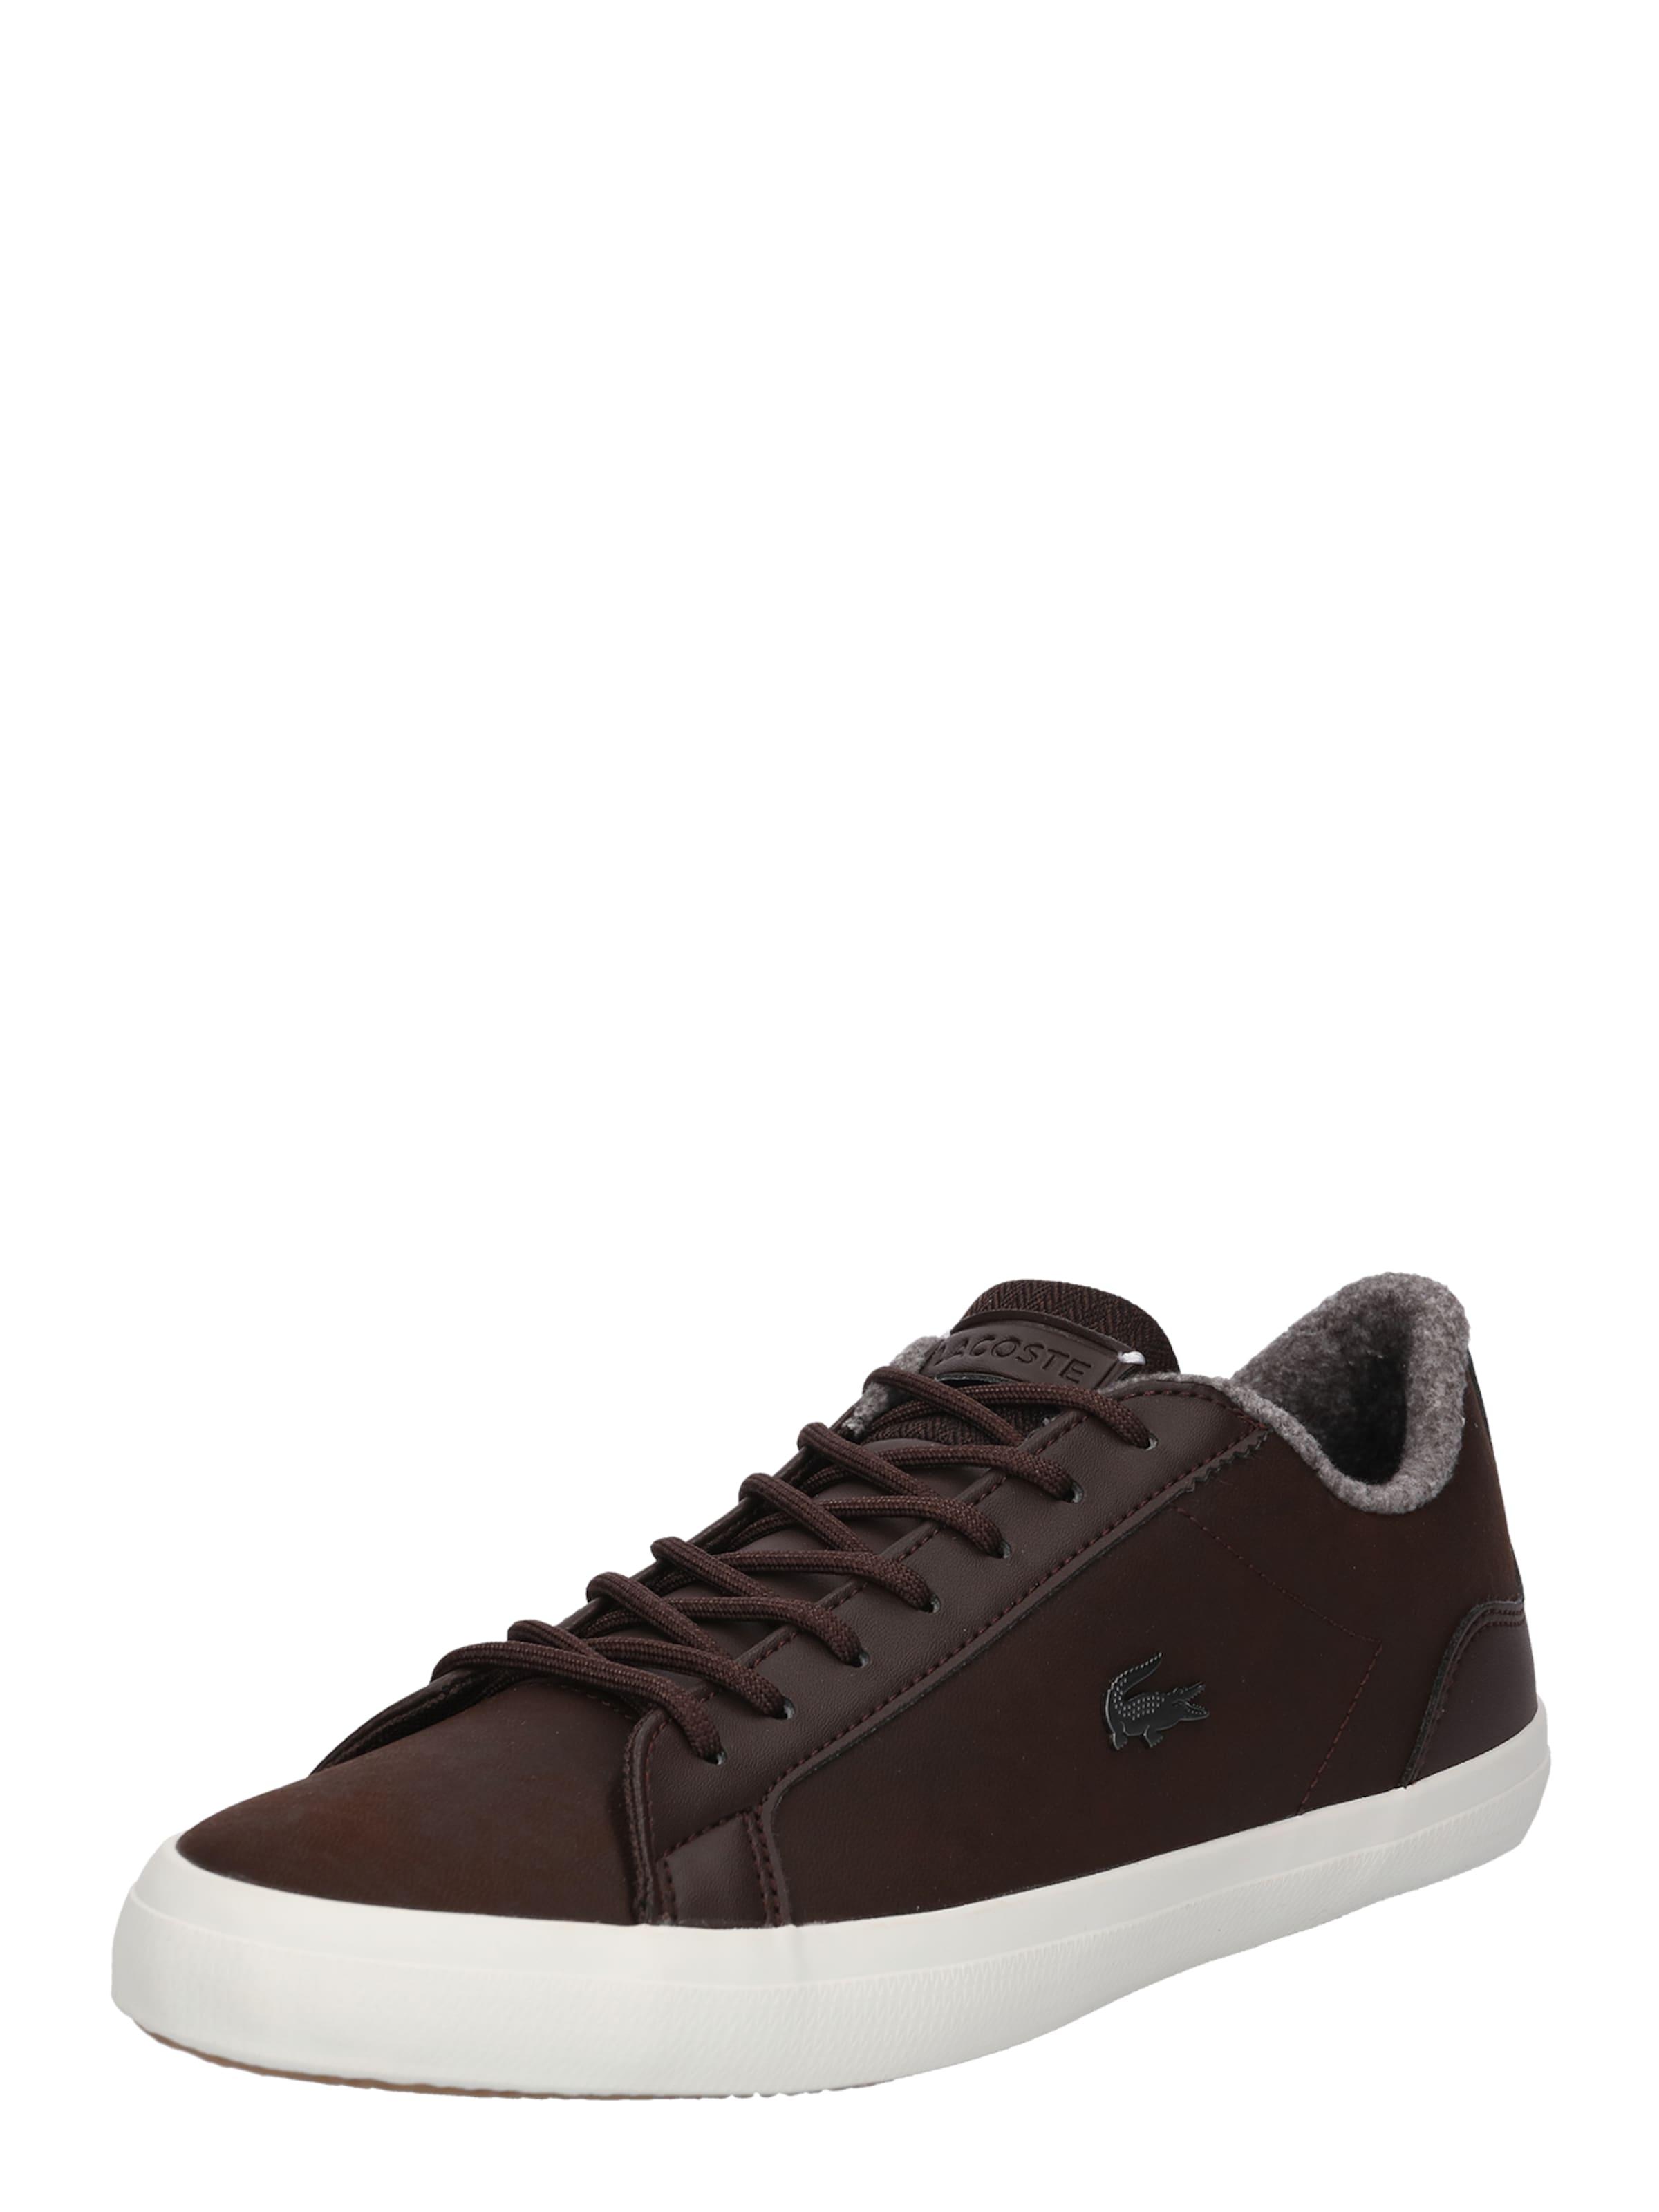 LACOSTE Sneaker Low LEROND Verschleißfeste billige Schuhe